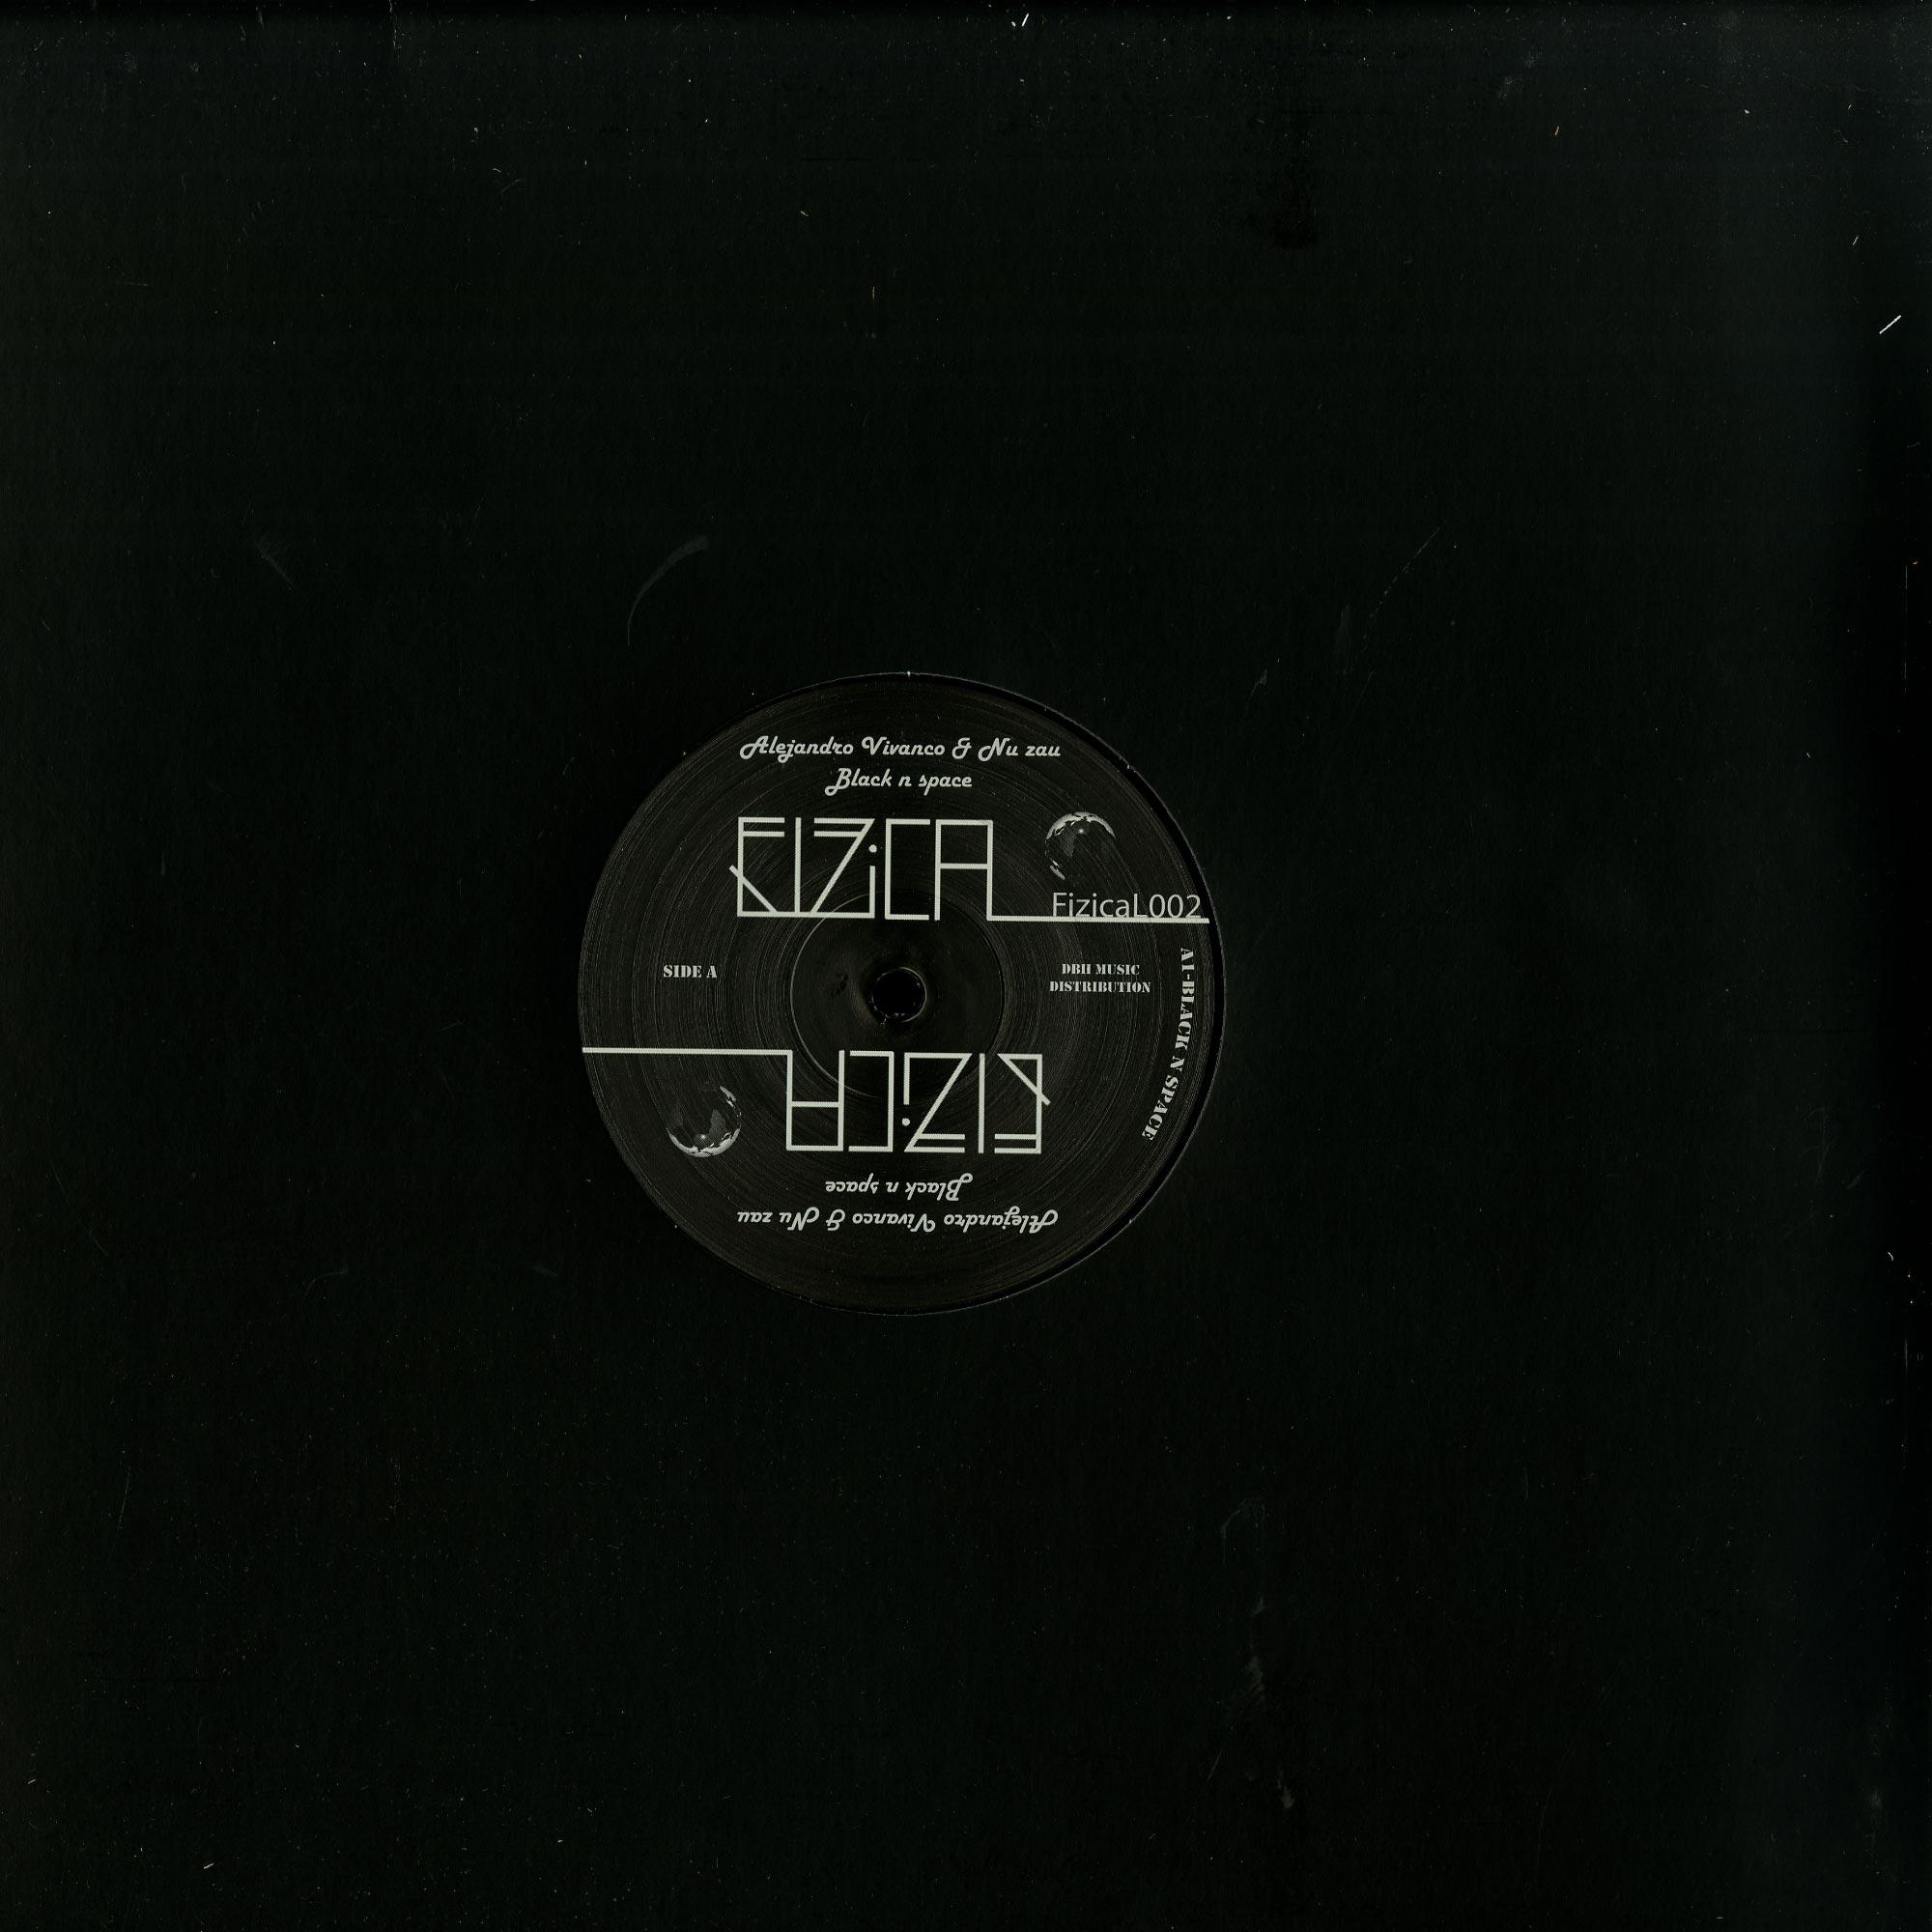 Alejandro Vivanco & Nu Zau - BLACK N SPACE